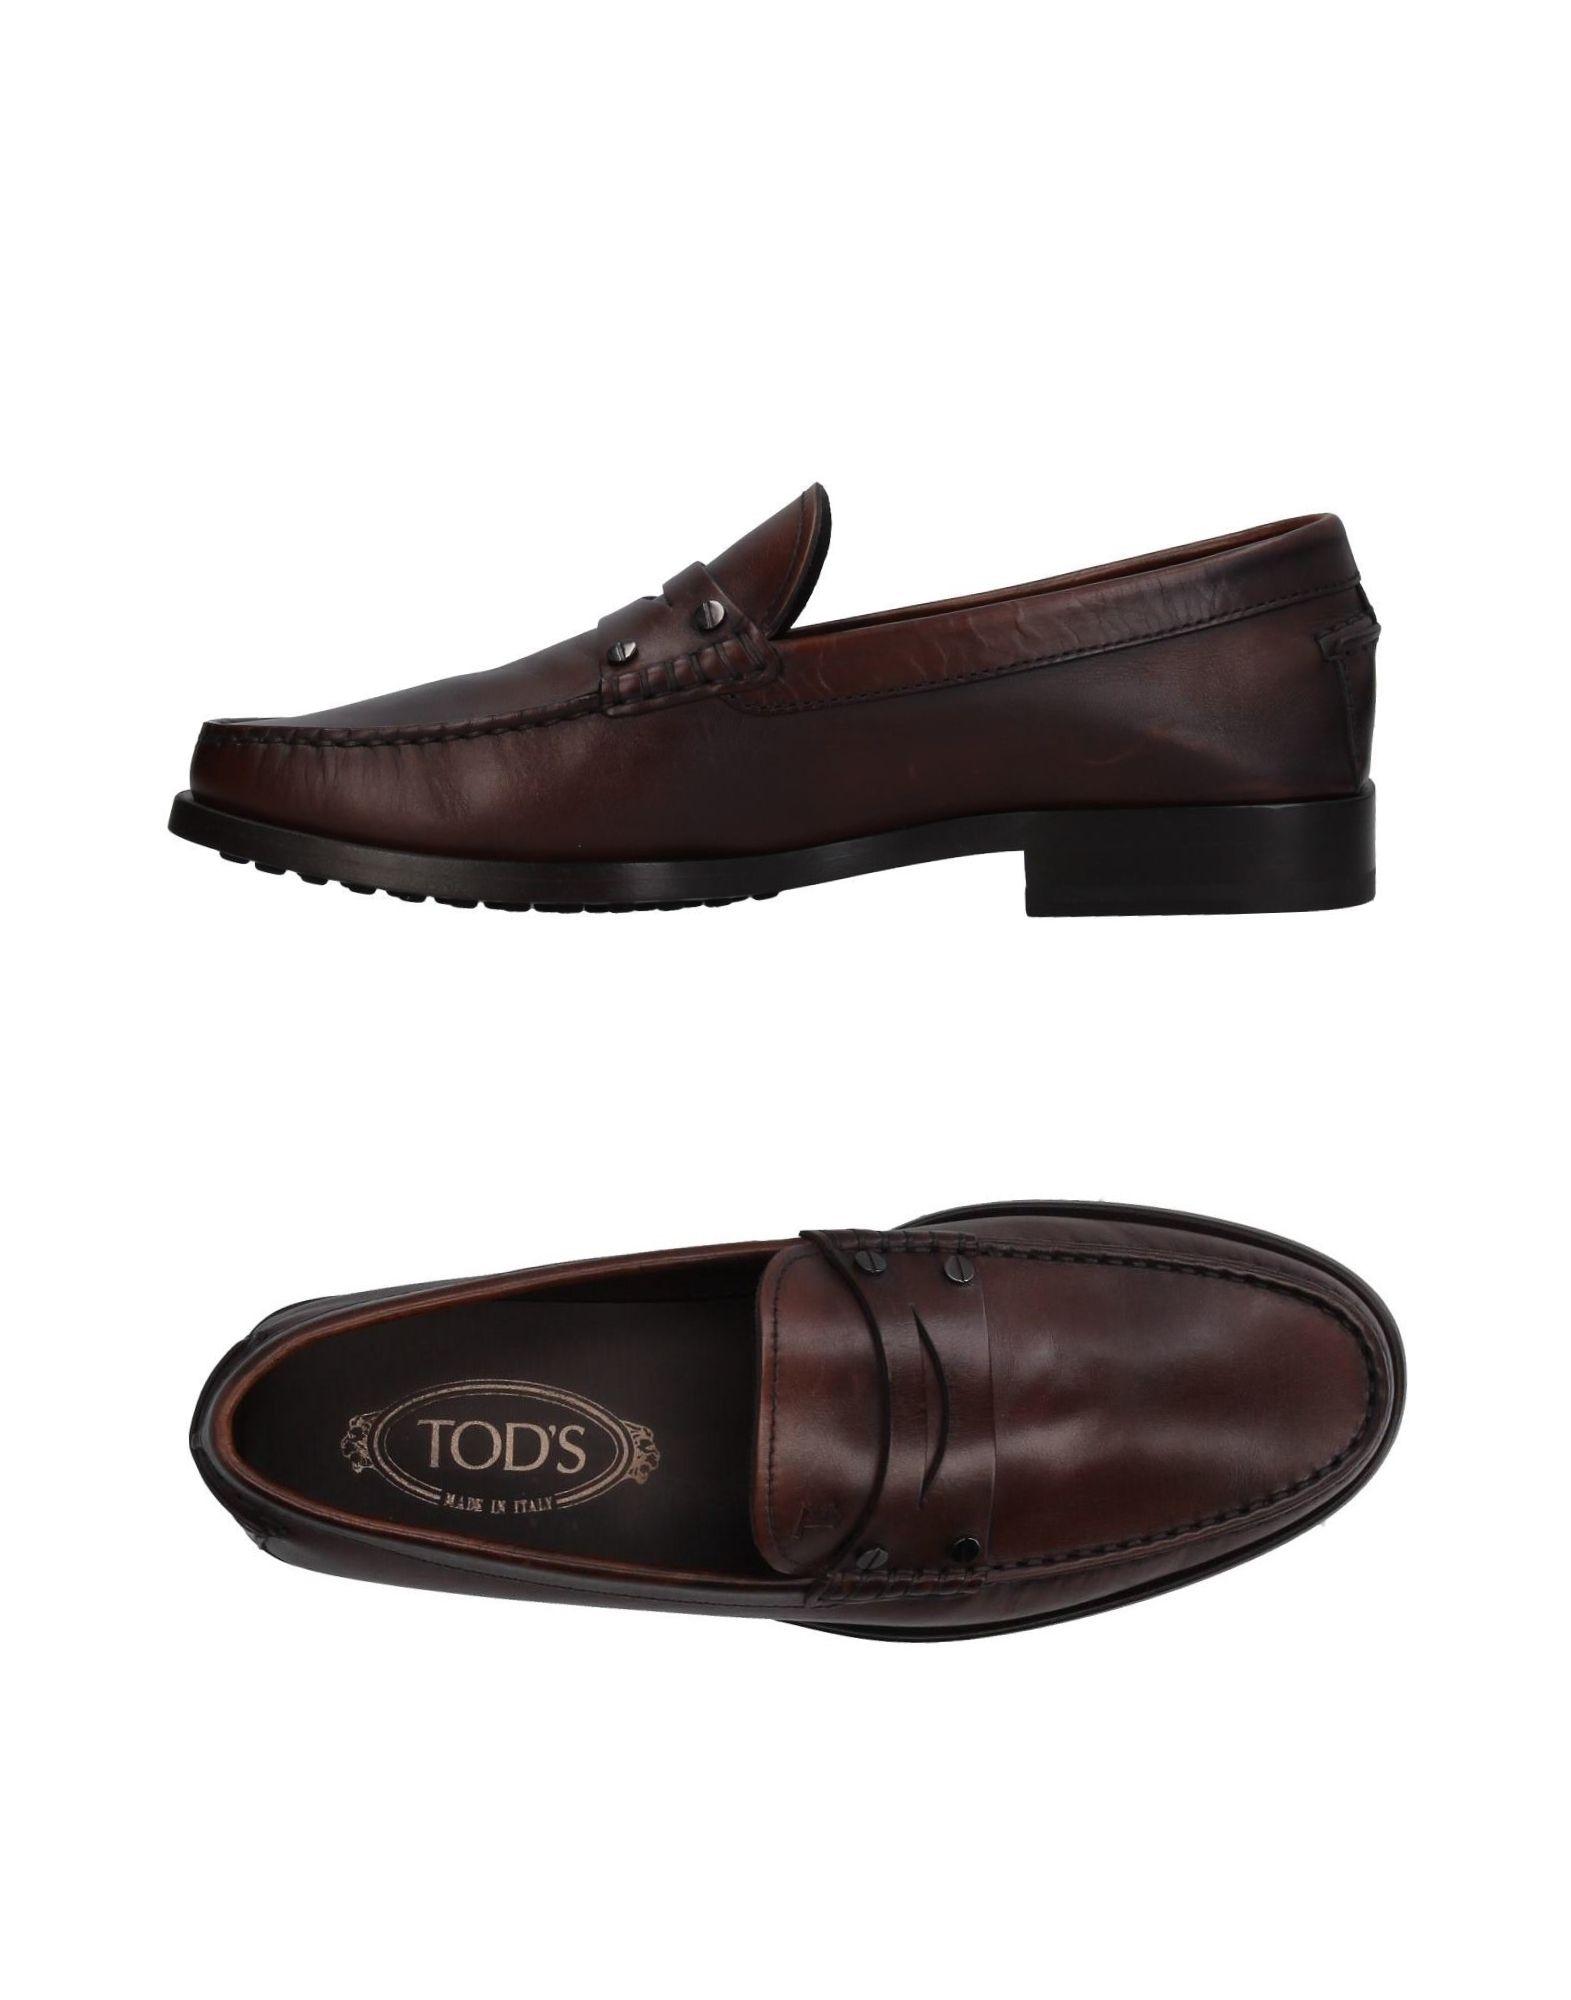 Tod's Mokassins Herren  11398196QG Gute Qualität beliebte Schuhe